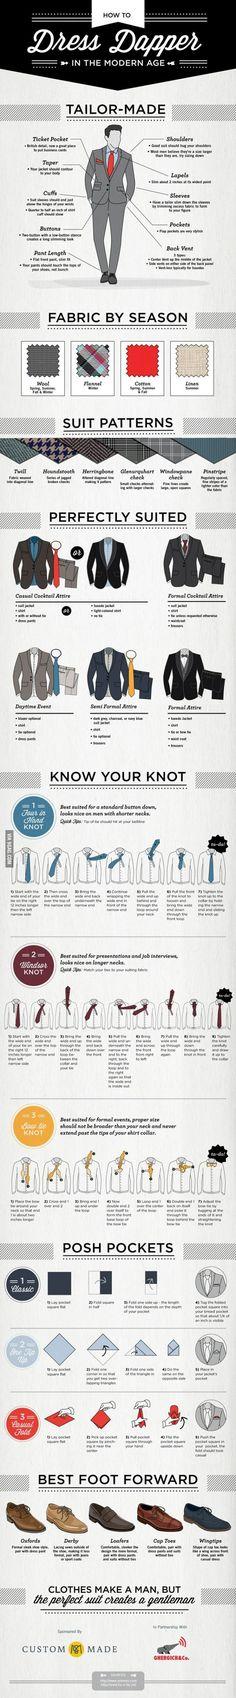 How to Dress Like a Gentleman | The Baum List